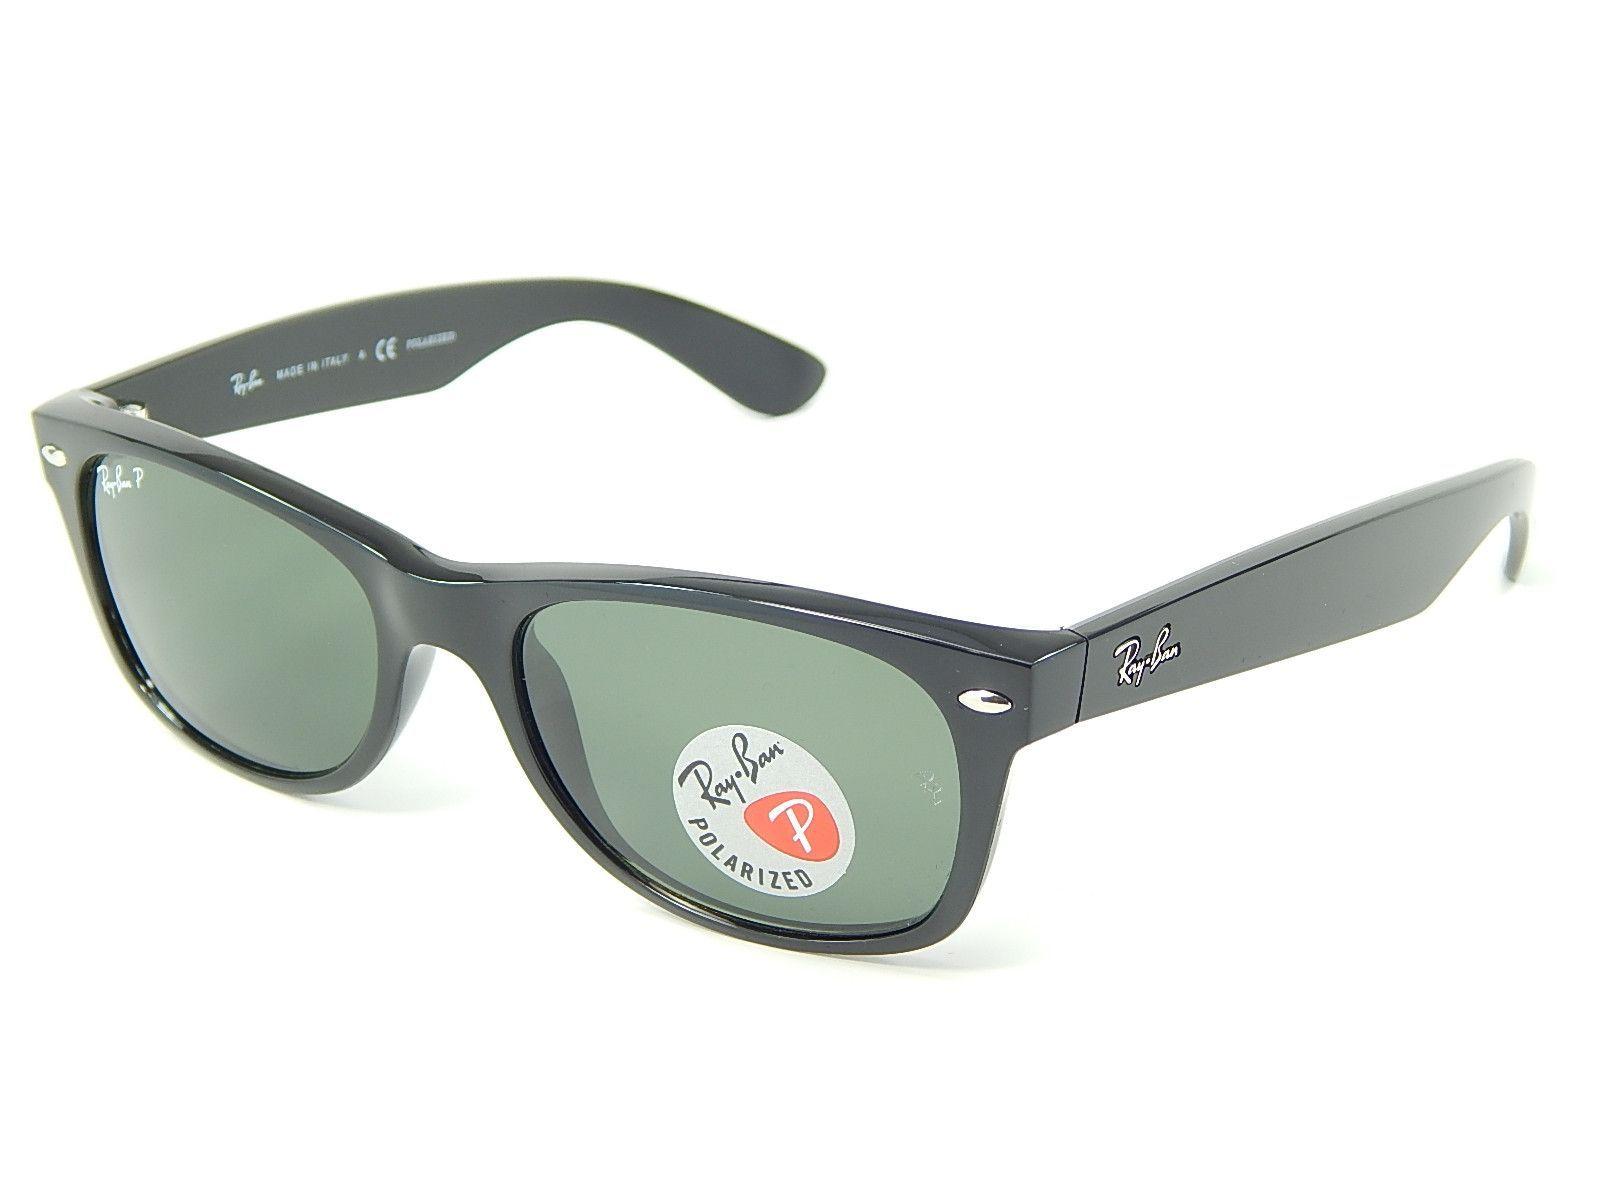 16a49b35bf Ray Ban Wayfarer RB2132 901 58 Black  Green Classic G-15 52mm Polarized  Sunglasses